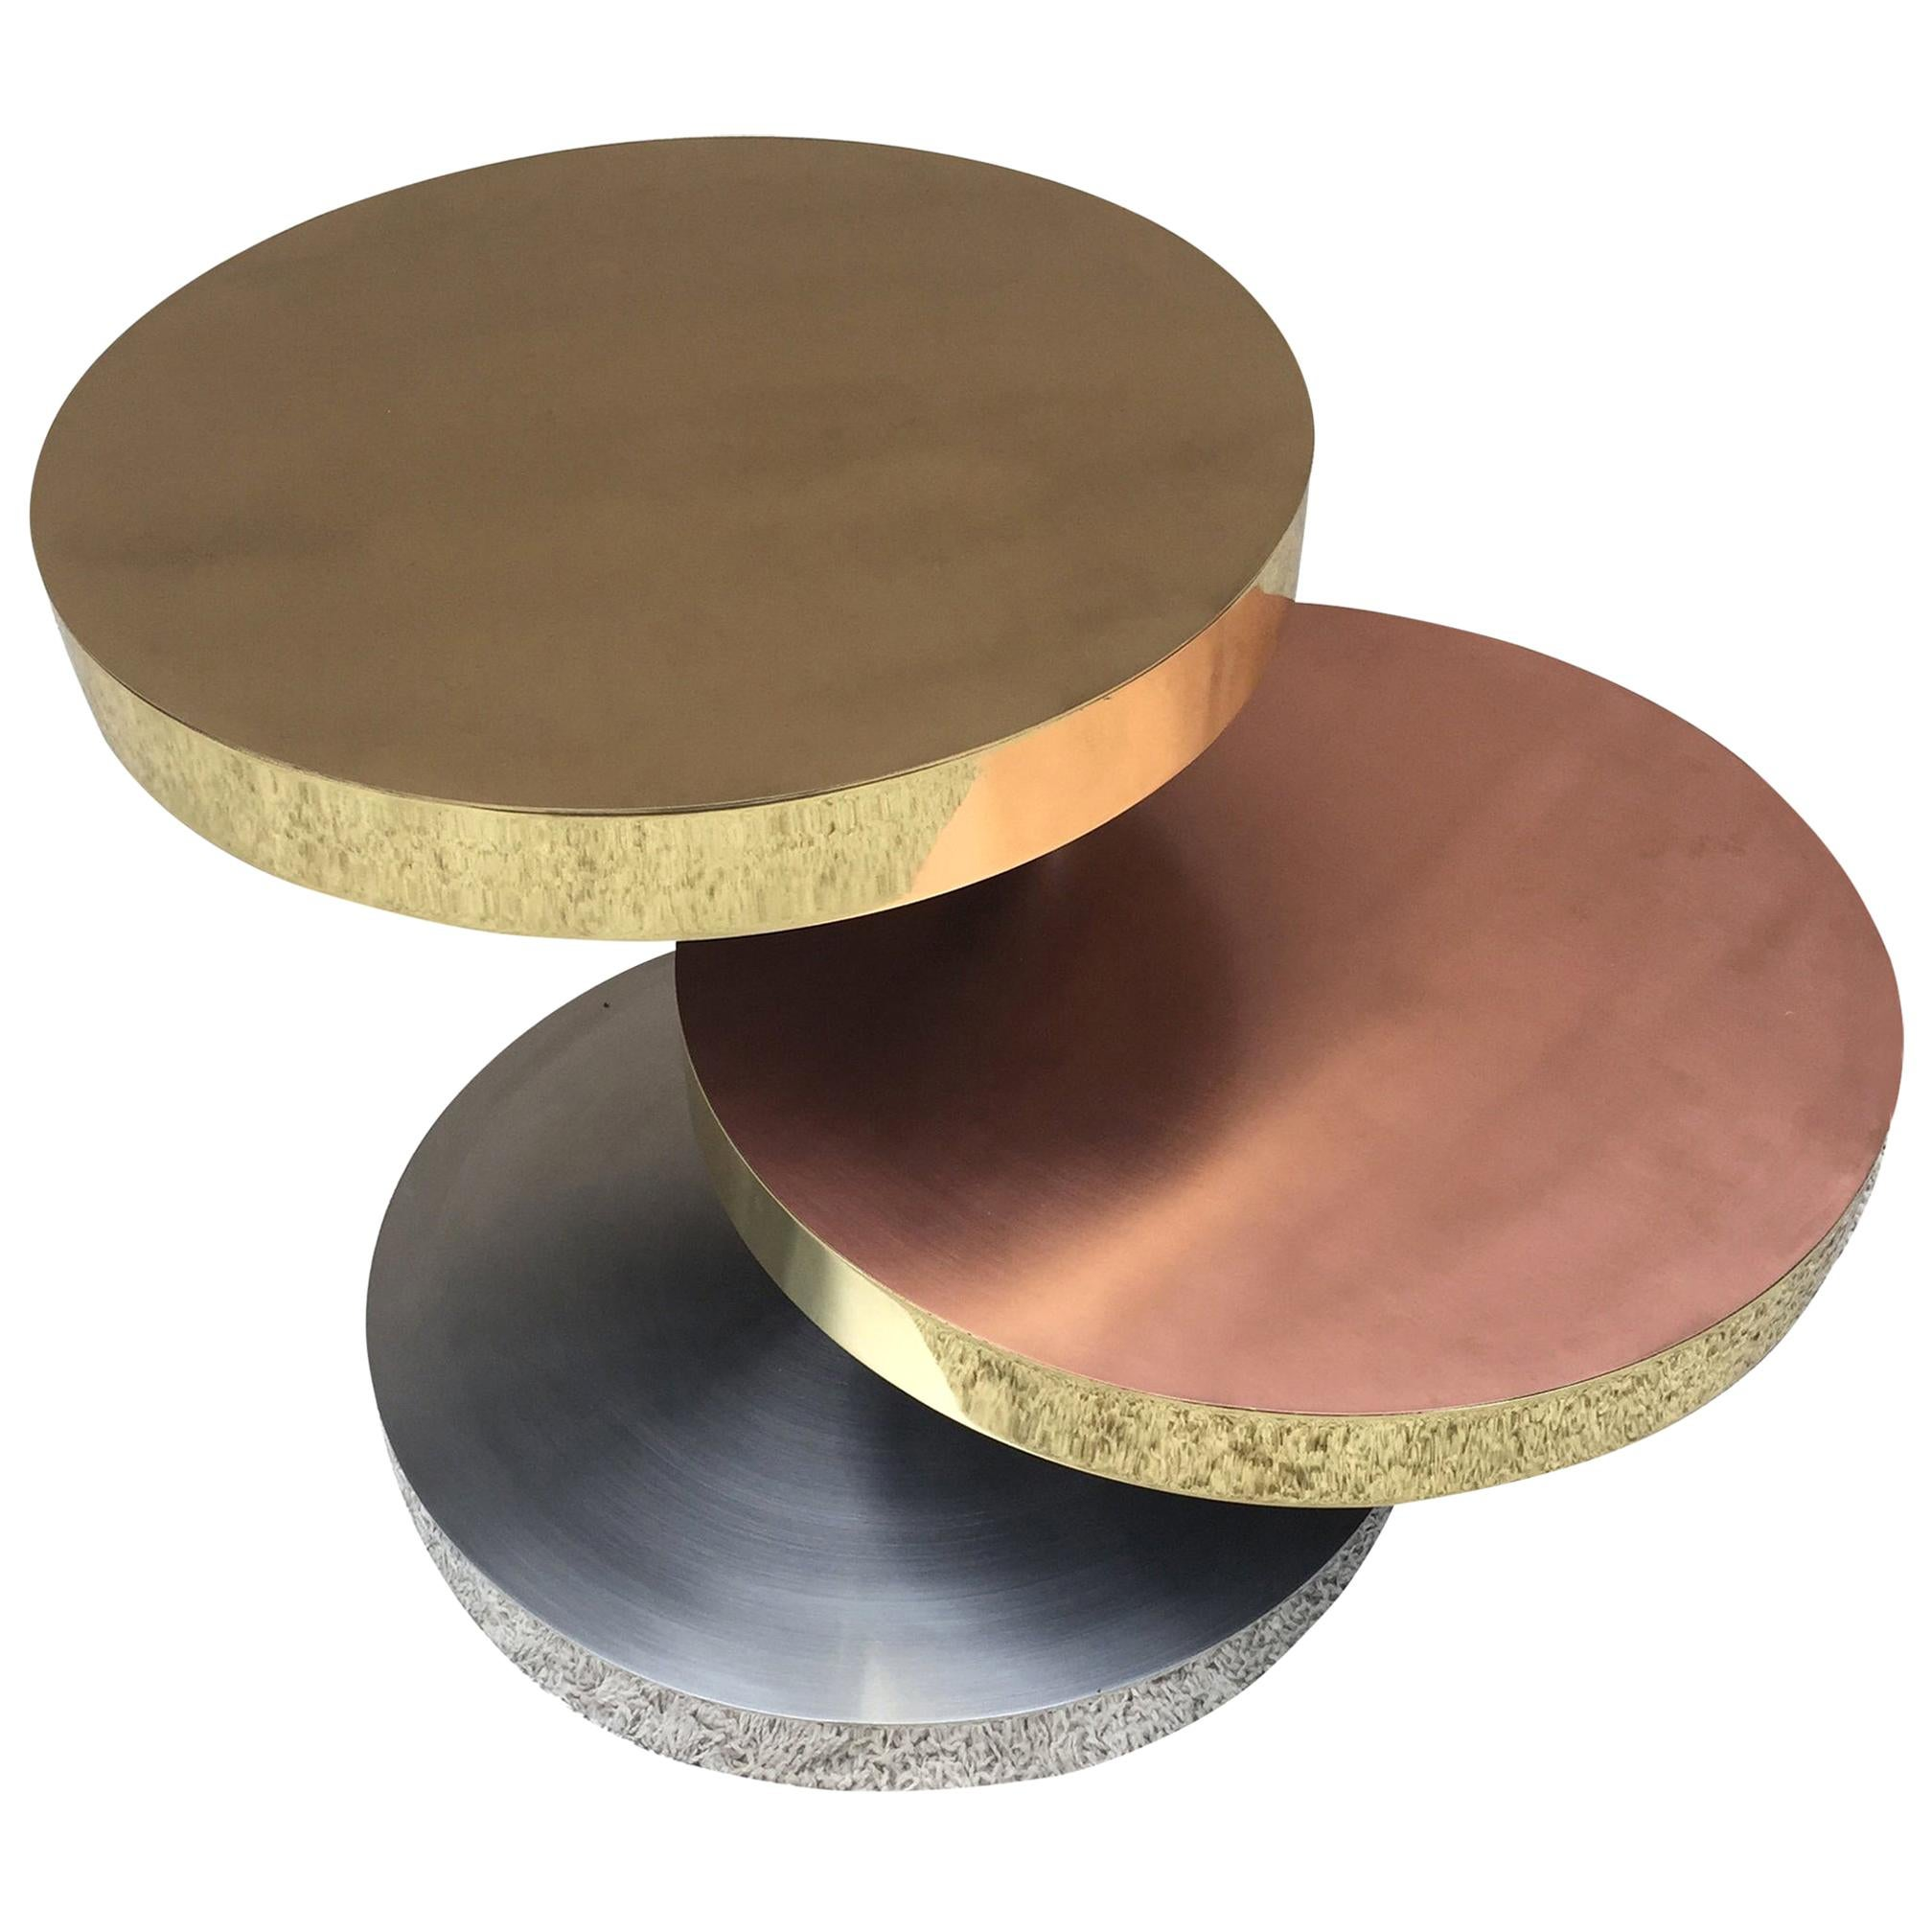 Maria Pergay Style Vintage Unsigned Adjustable Design Three-Tiered Swivel Table